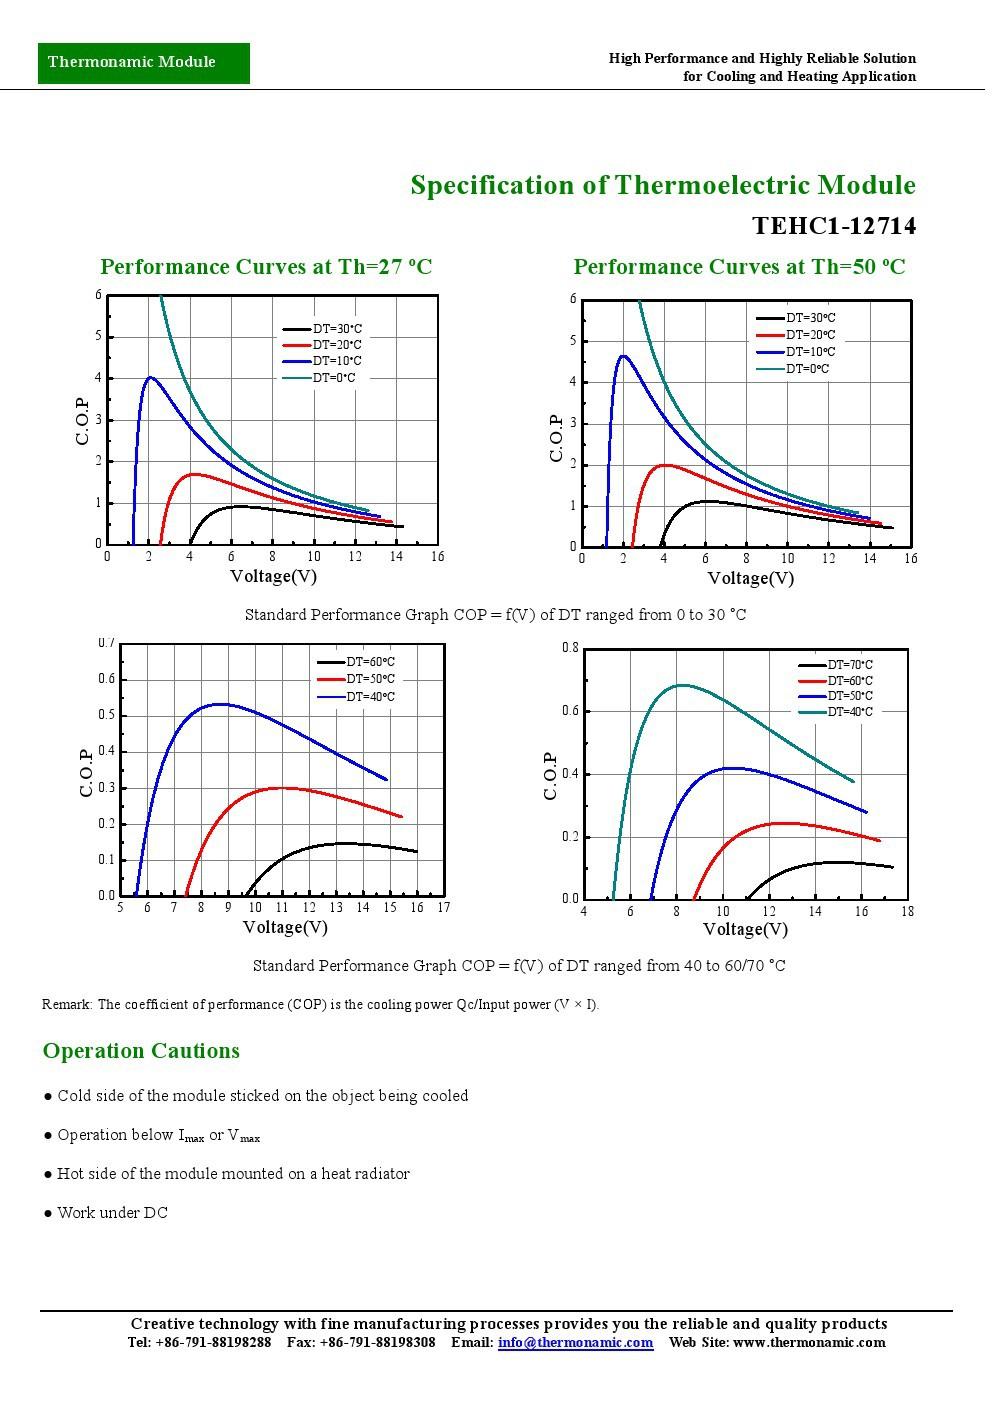 Peltier Module TEHC1-12714